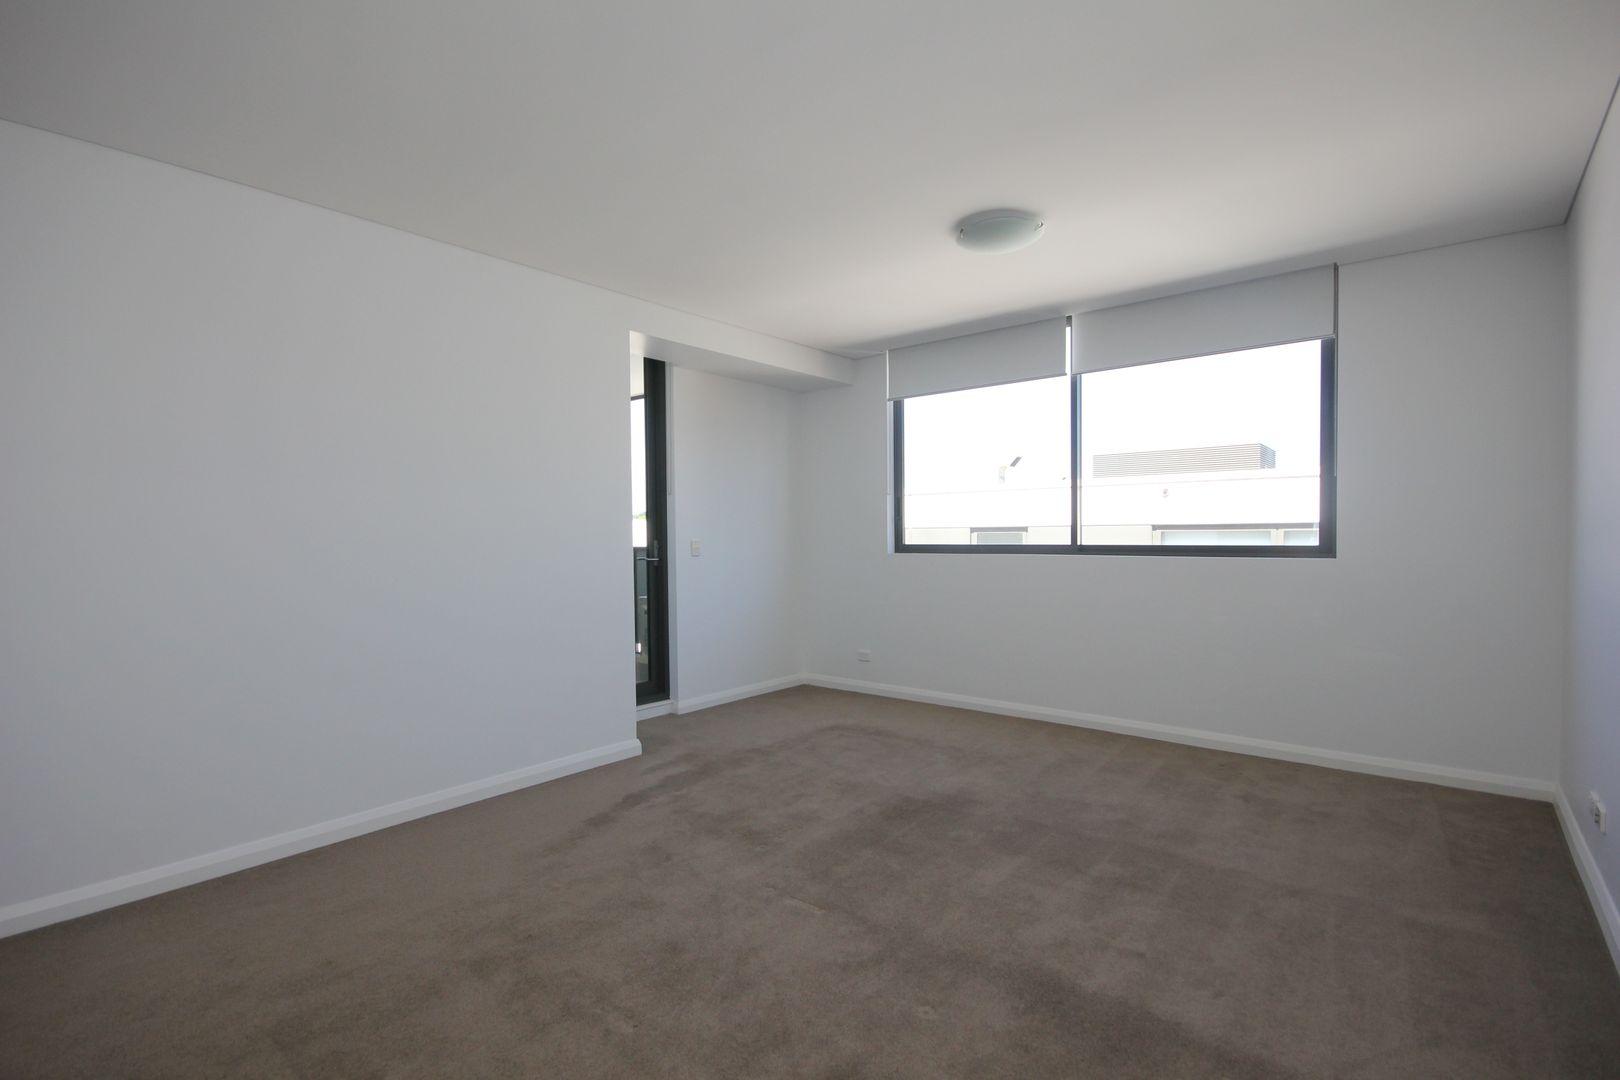 C308/11 Mashman Avenue, Kingsgrove NSW 2208, Image 1